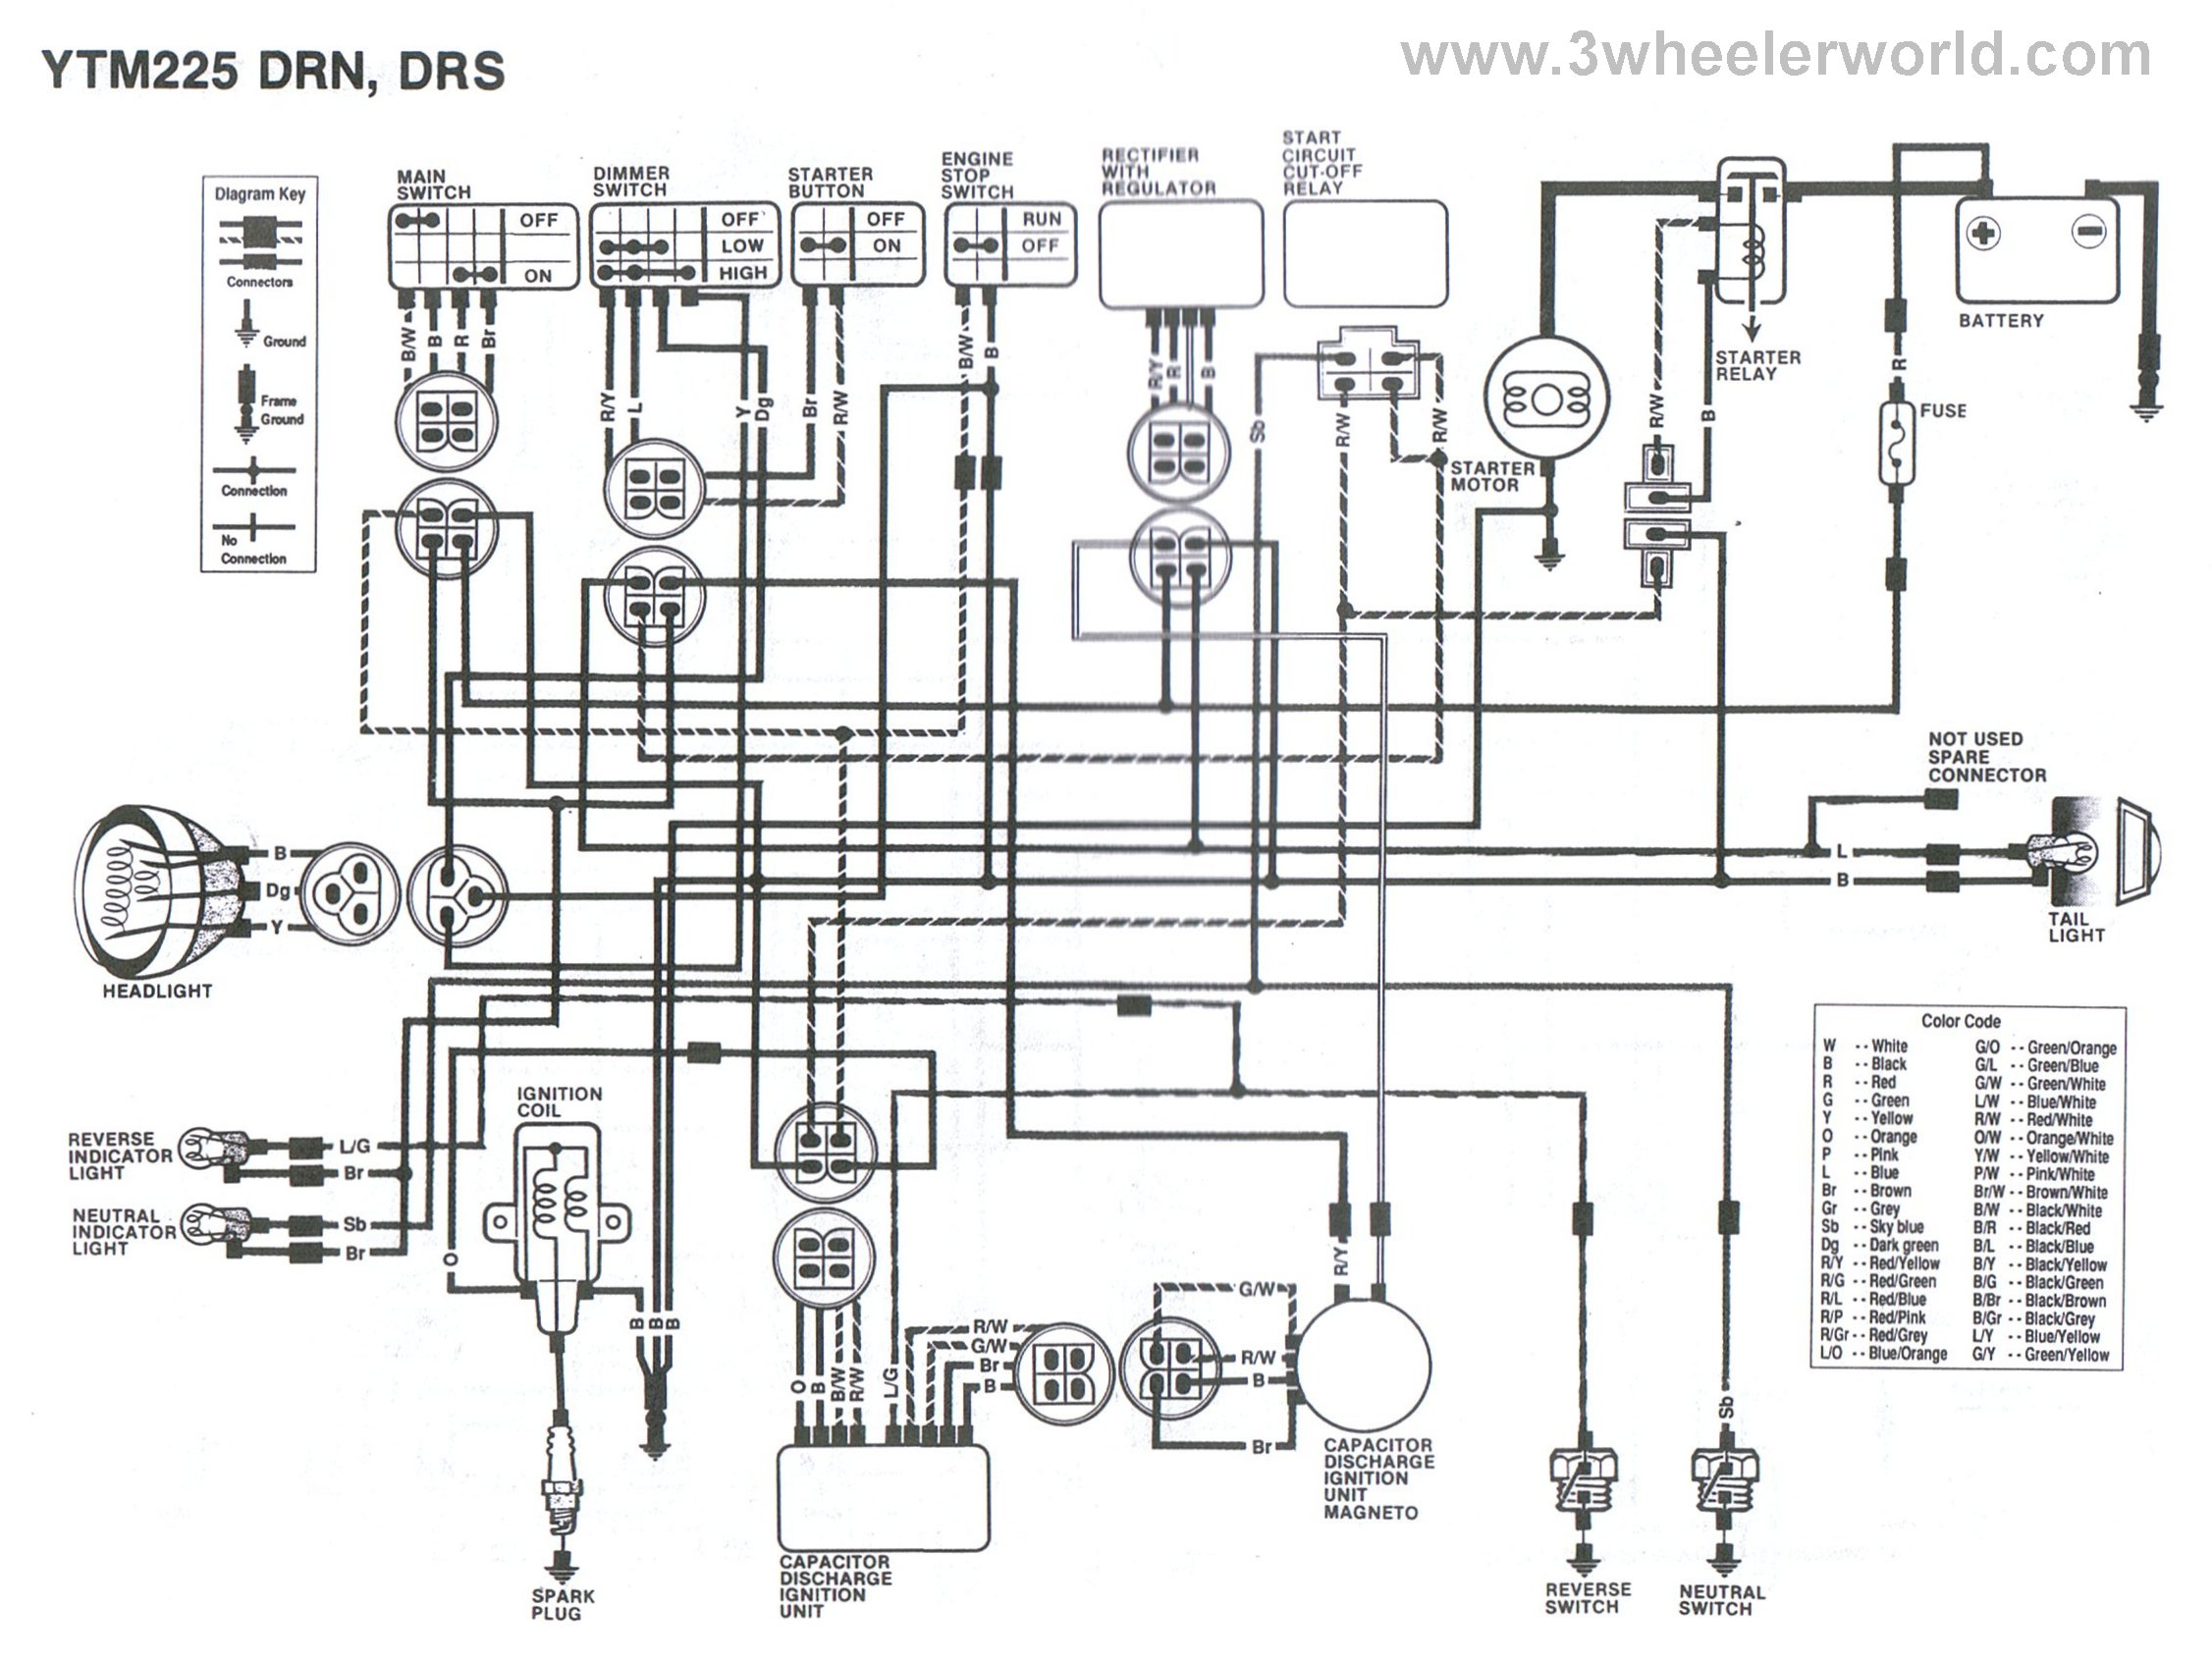 wrg 2570] 83 yamaha virago wiring diagram  wiring diagram 1983 yamaha midnight maxim #13